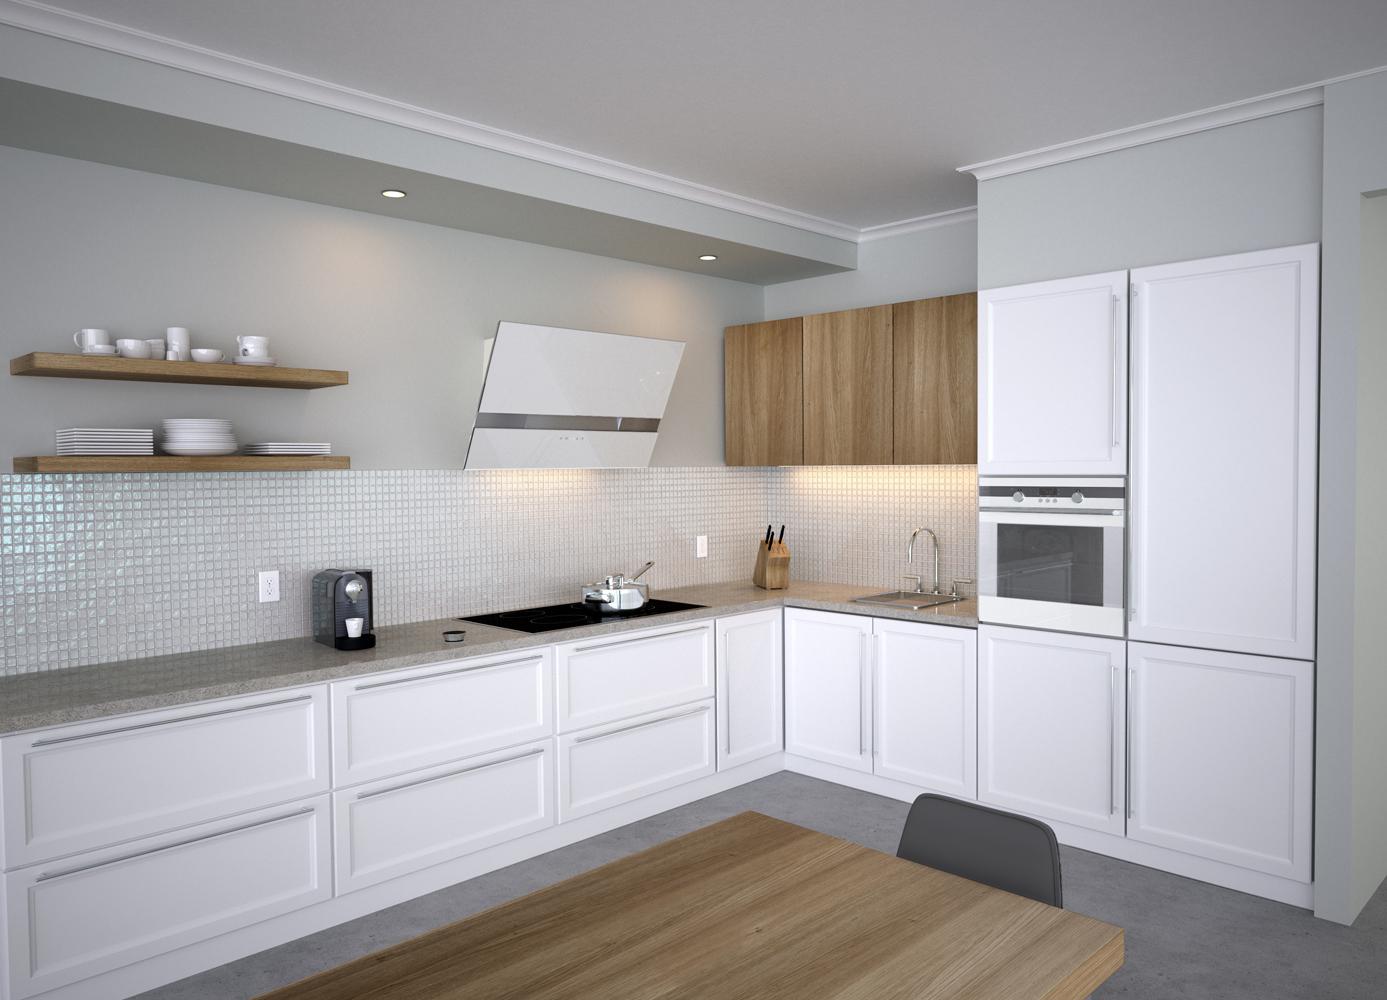 Zephyr Introduces Vertical Style Kitchen Ventilation Hoods